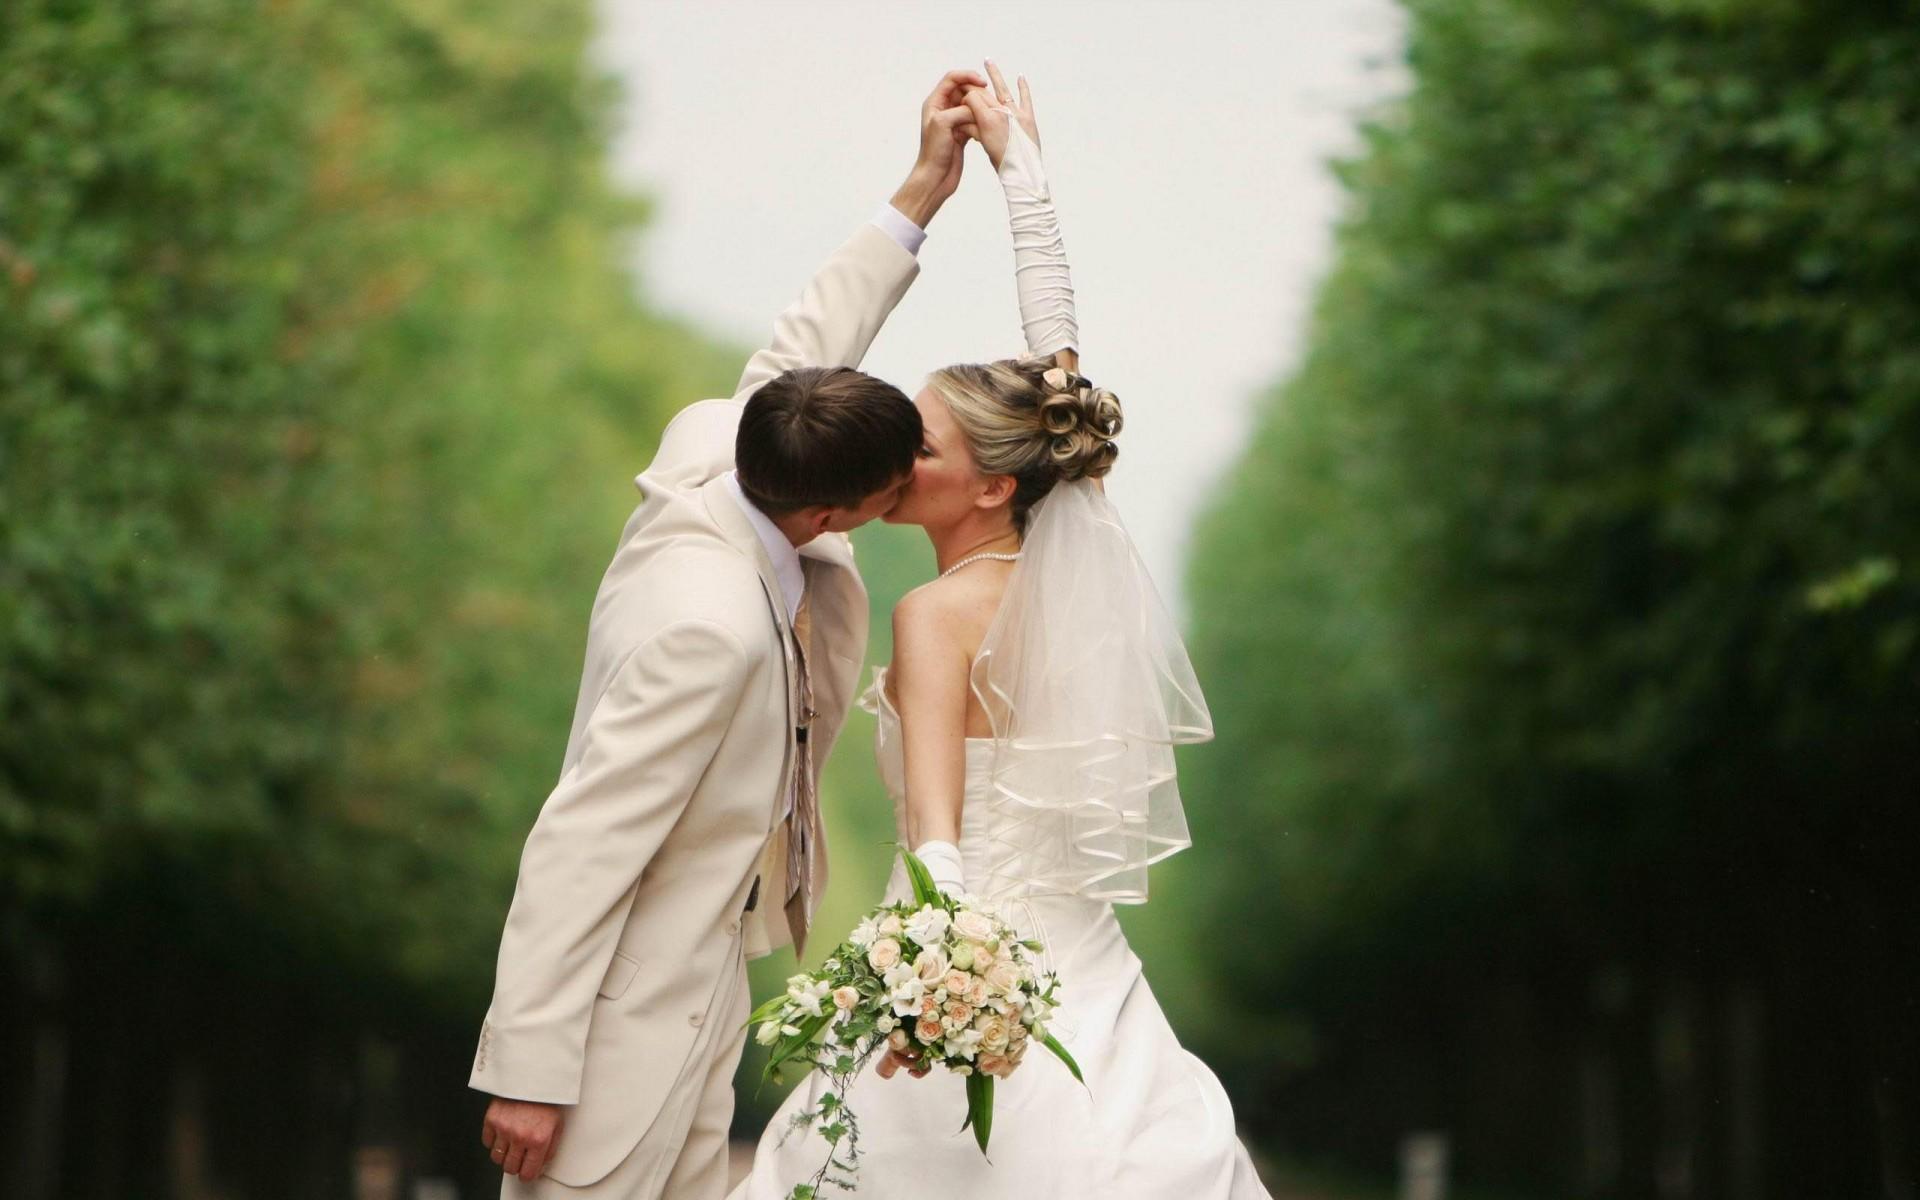 Wedding kiss wallpaper download cool hd wallpapers here junglespirit Gallery